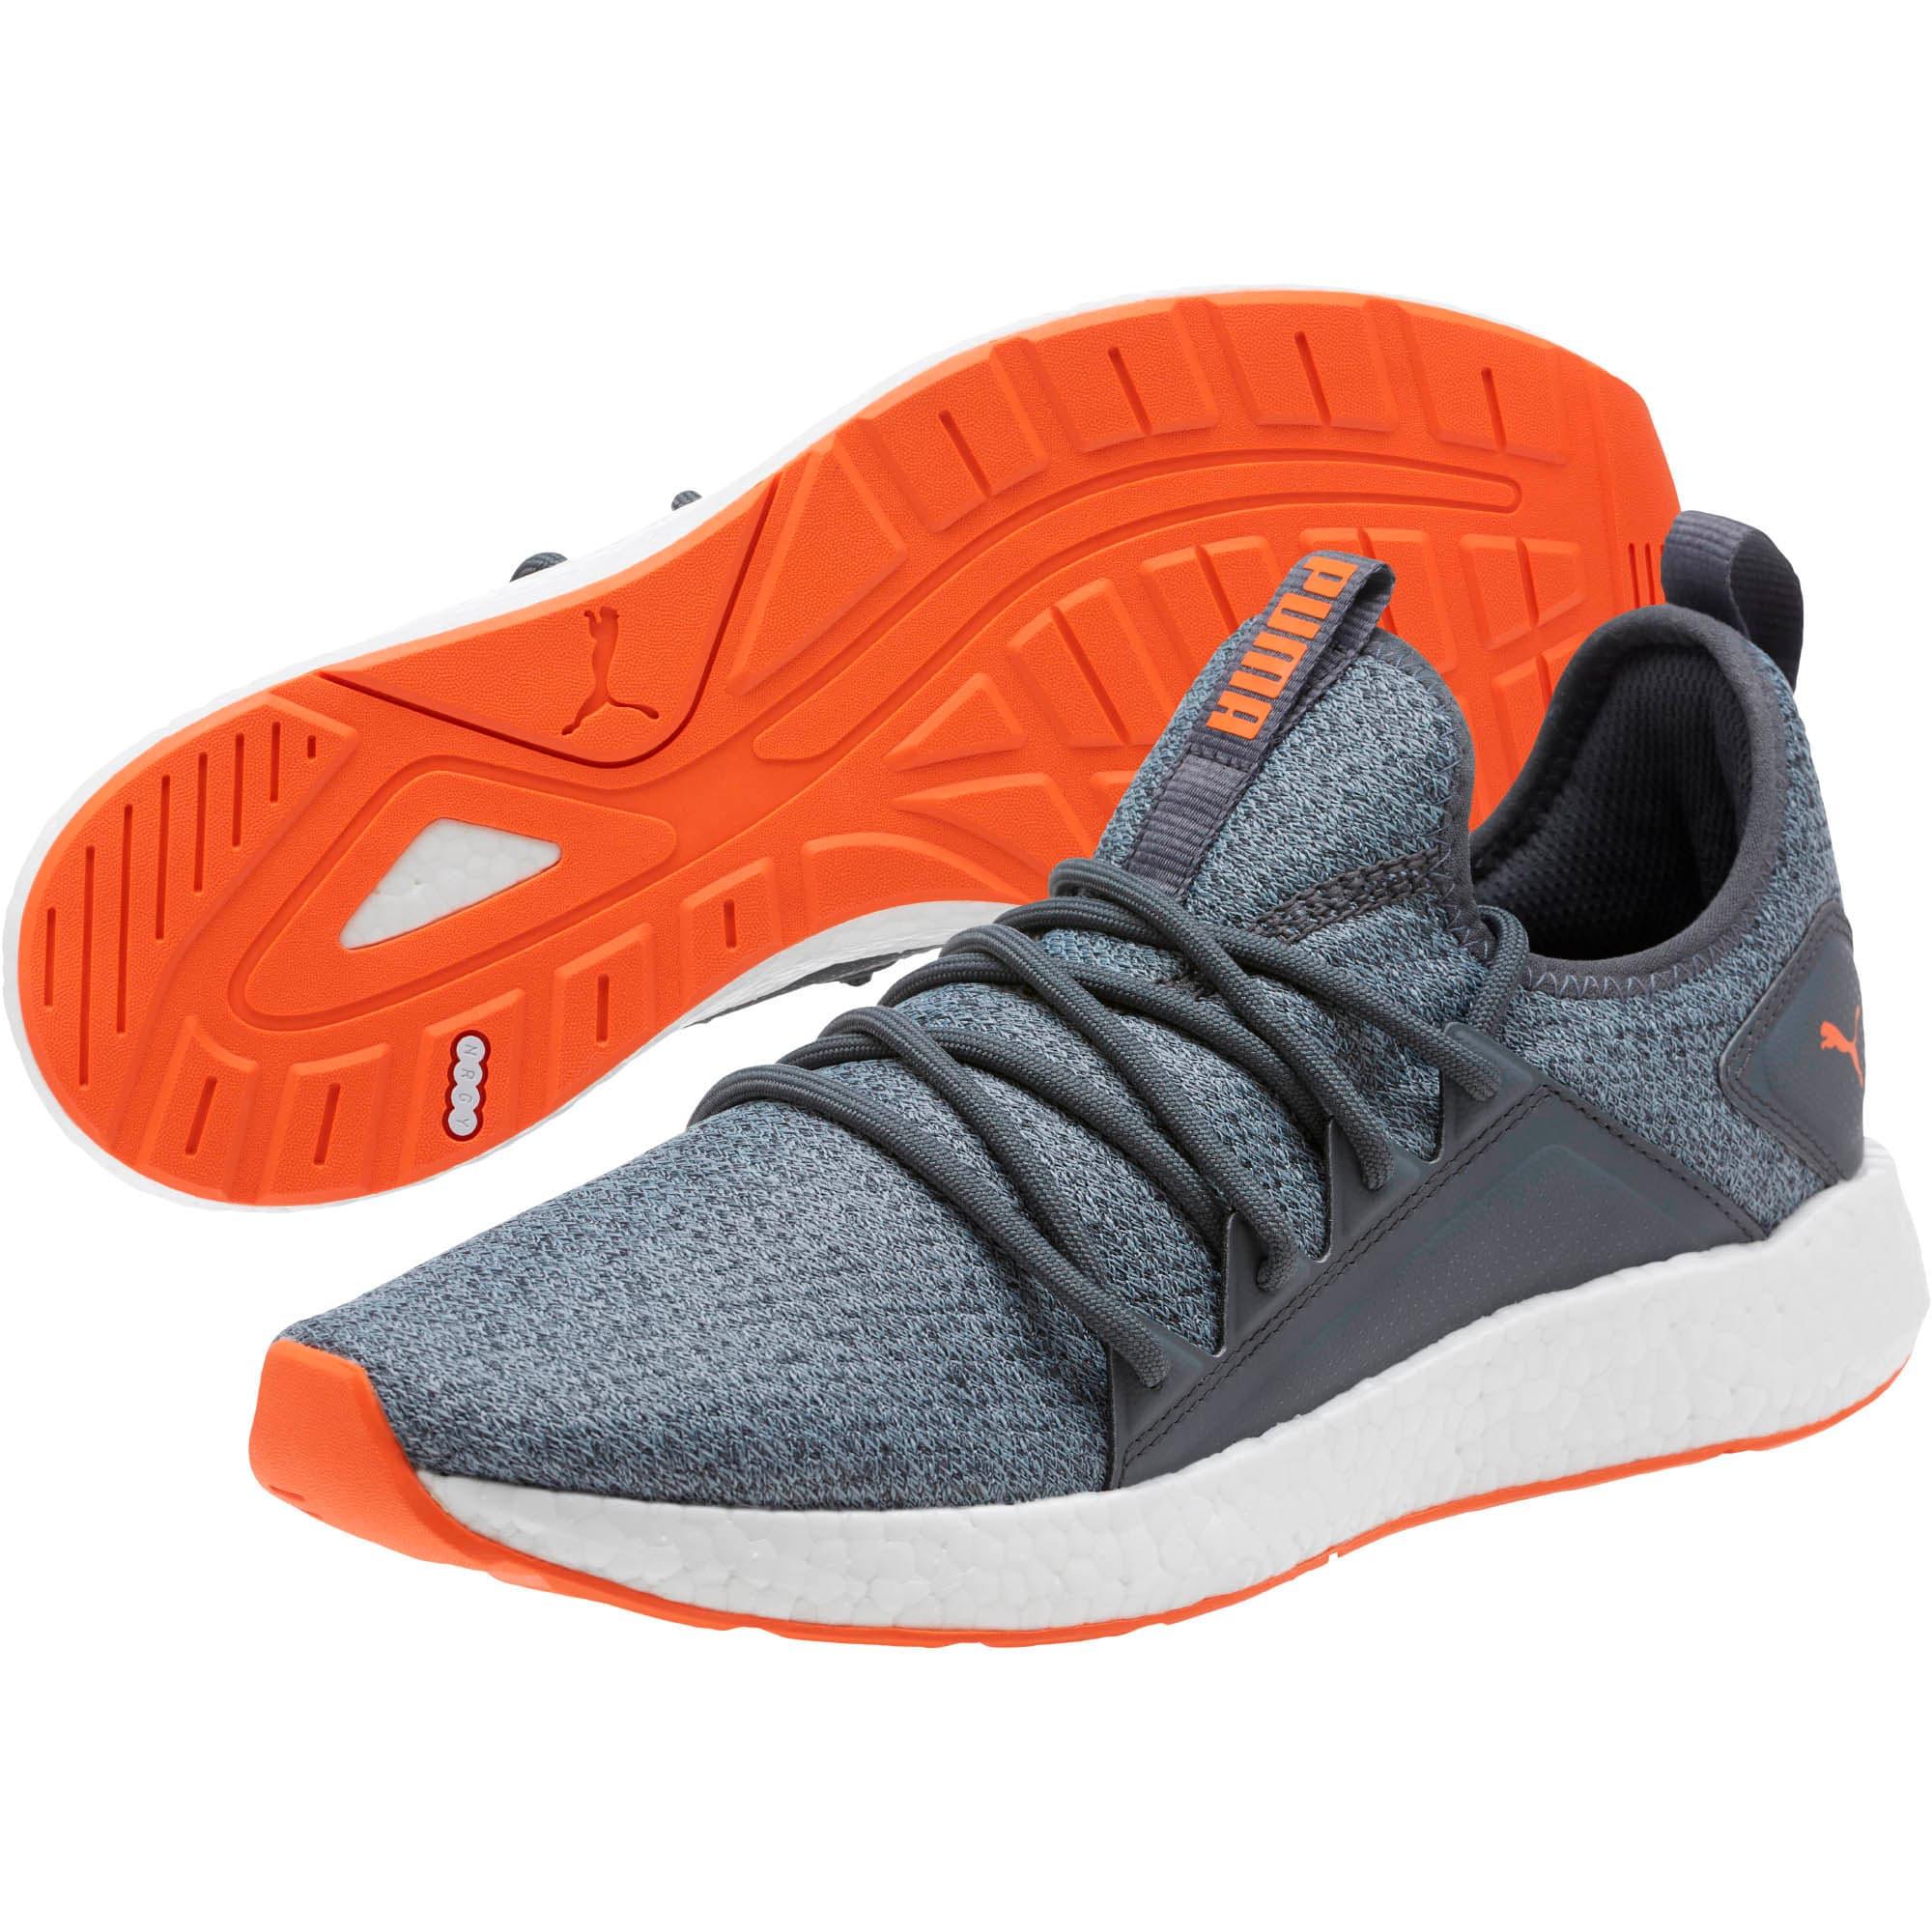 Thumbnail 2 of NRGY Neko Knit Men's Running Shoes, Iron Gate-Firecracker, medium